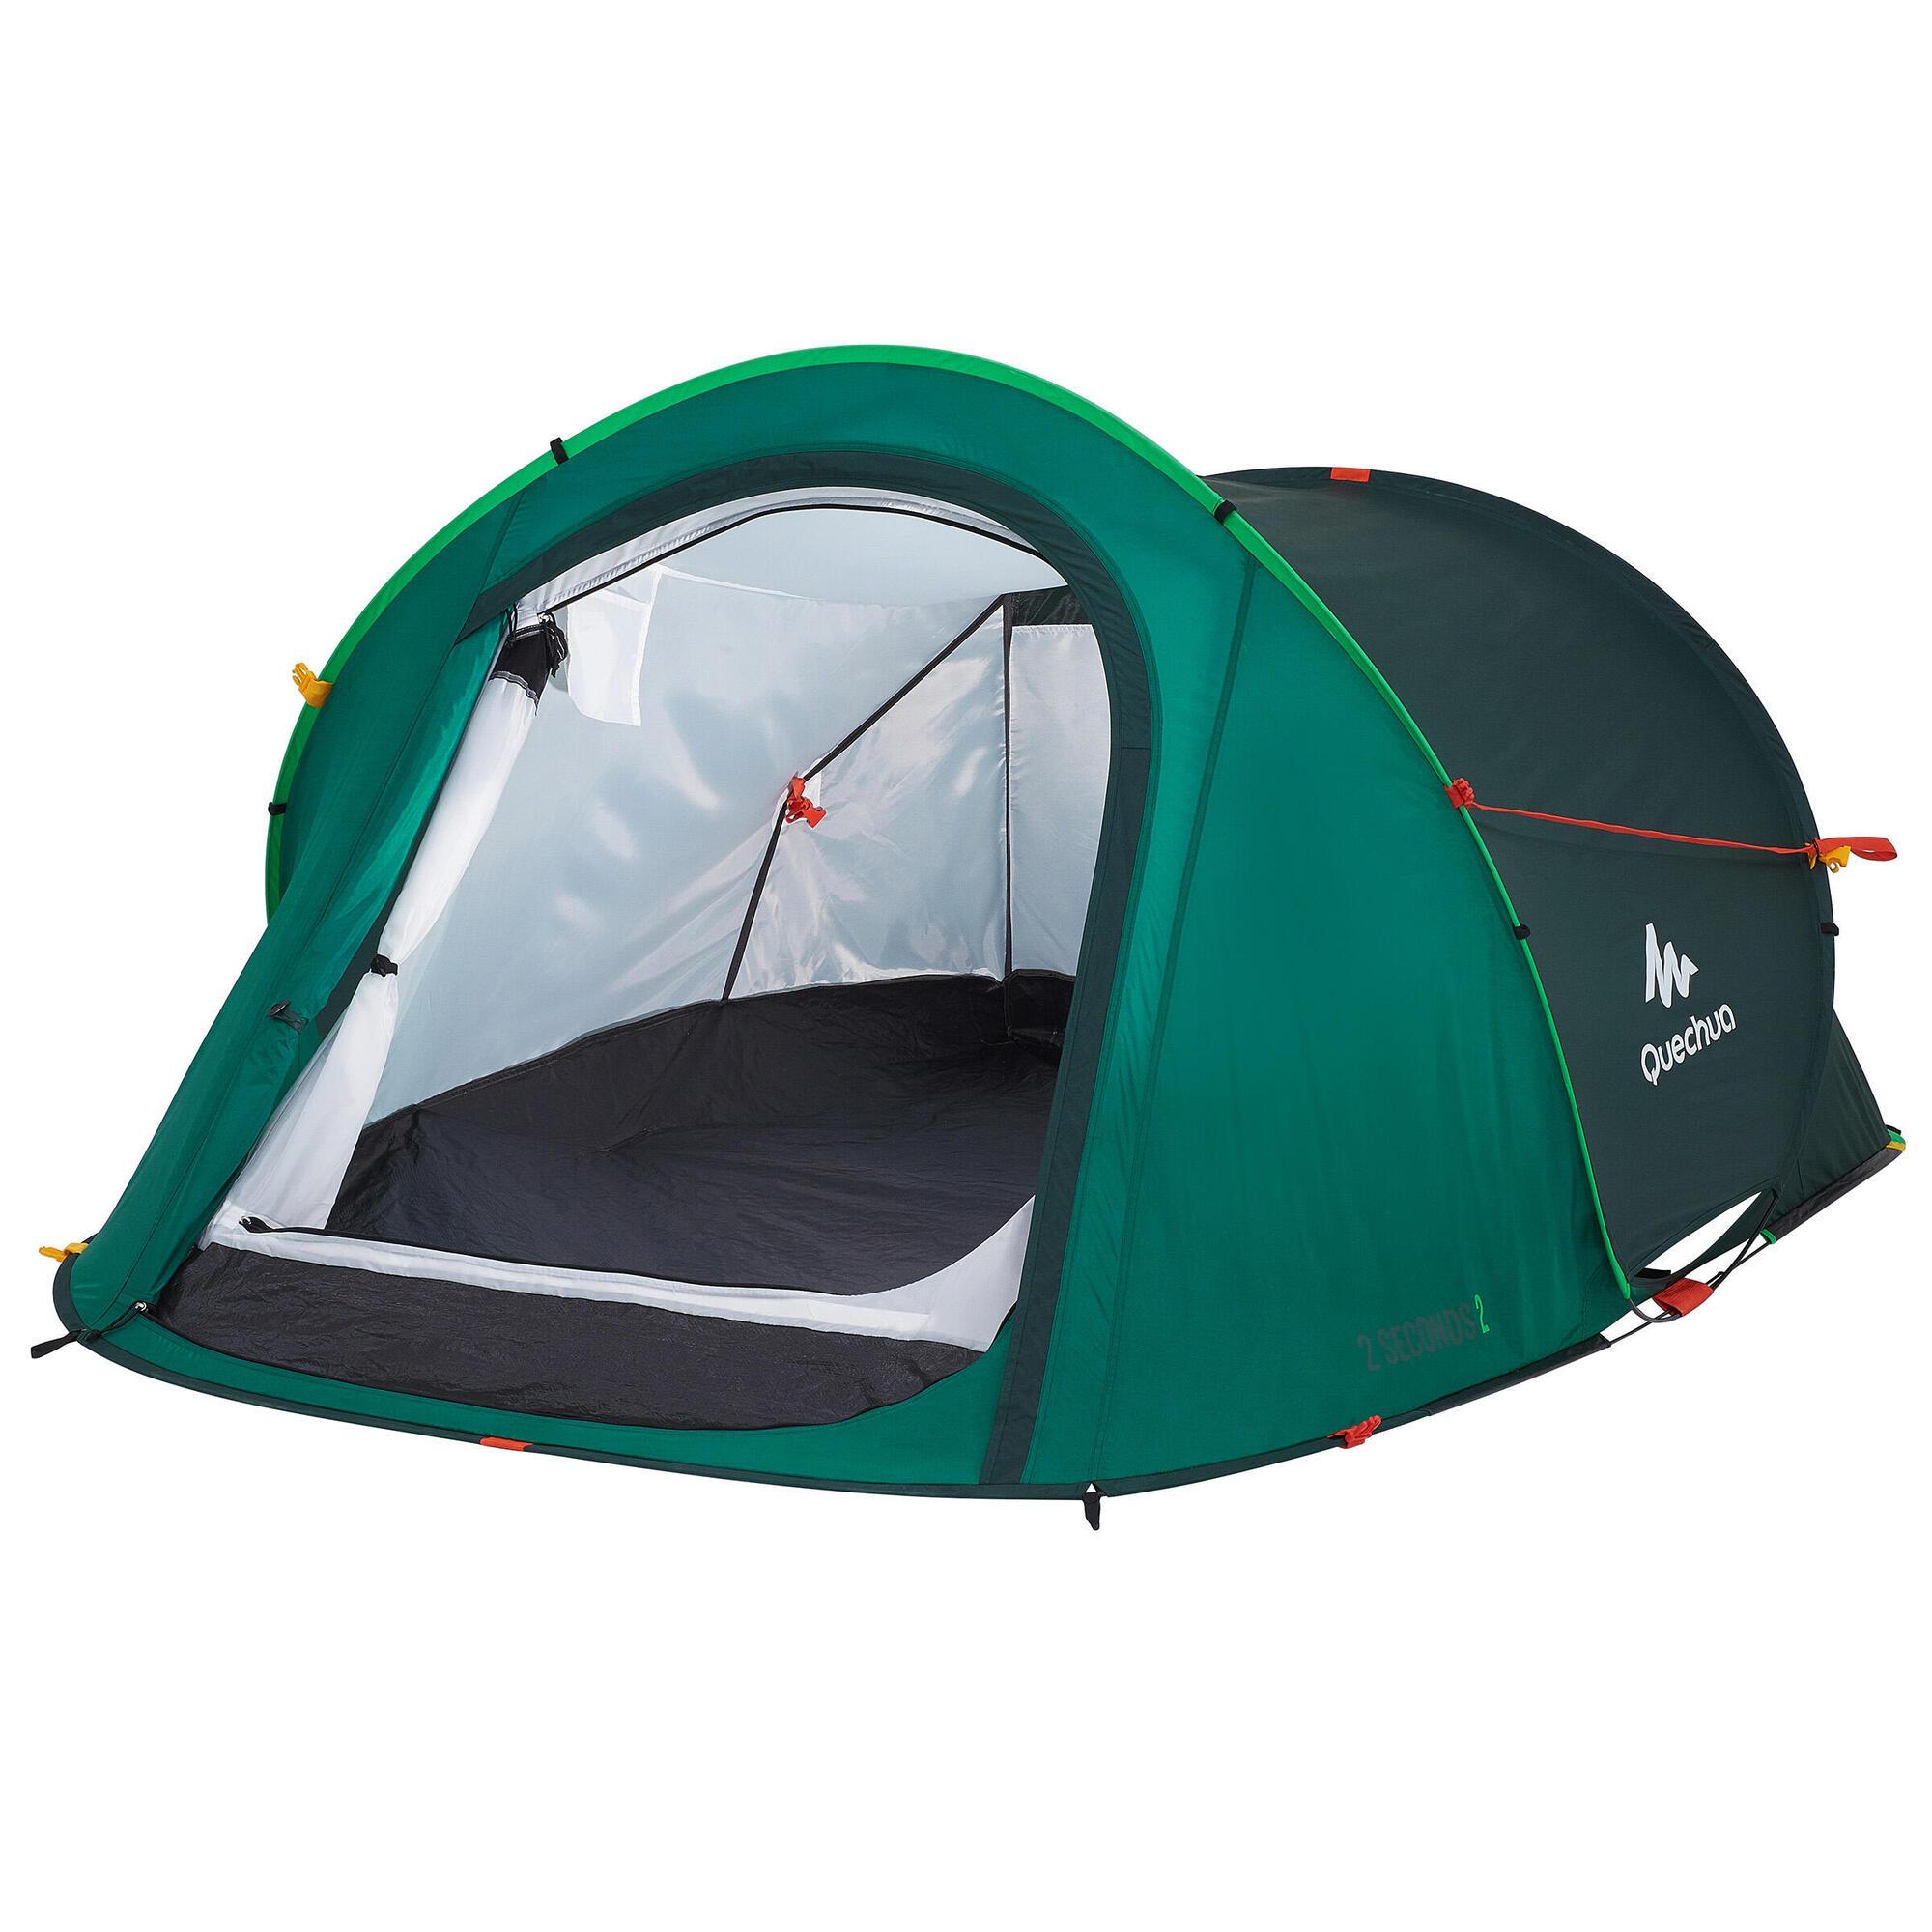 2 Seconds 2-Man Camping Tent